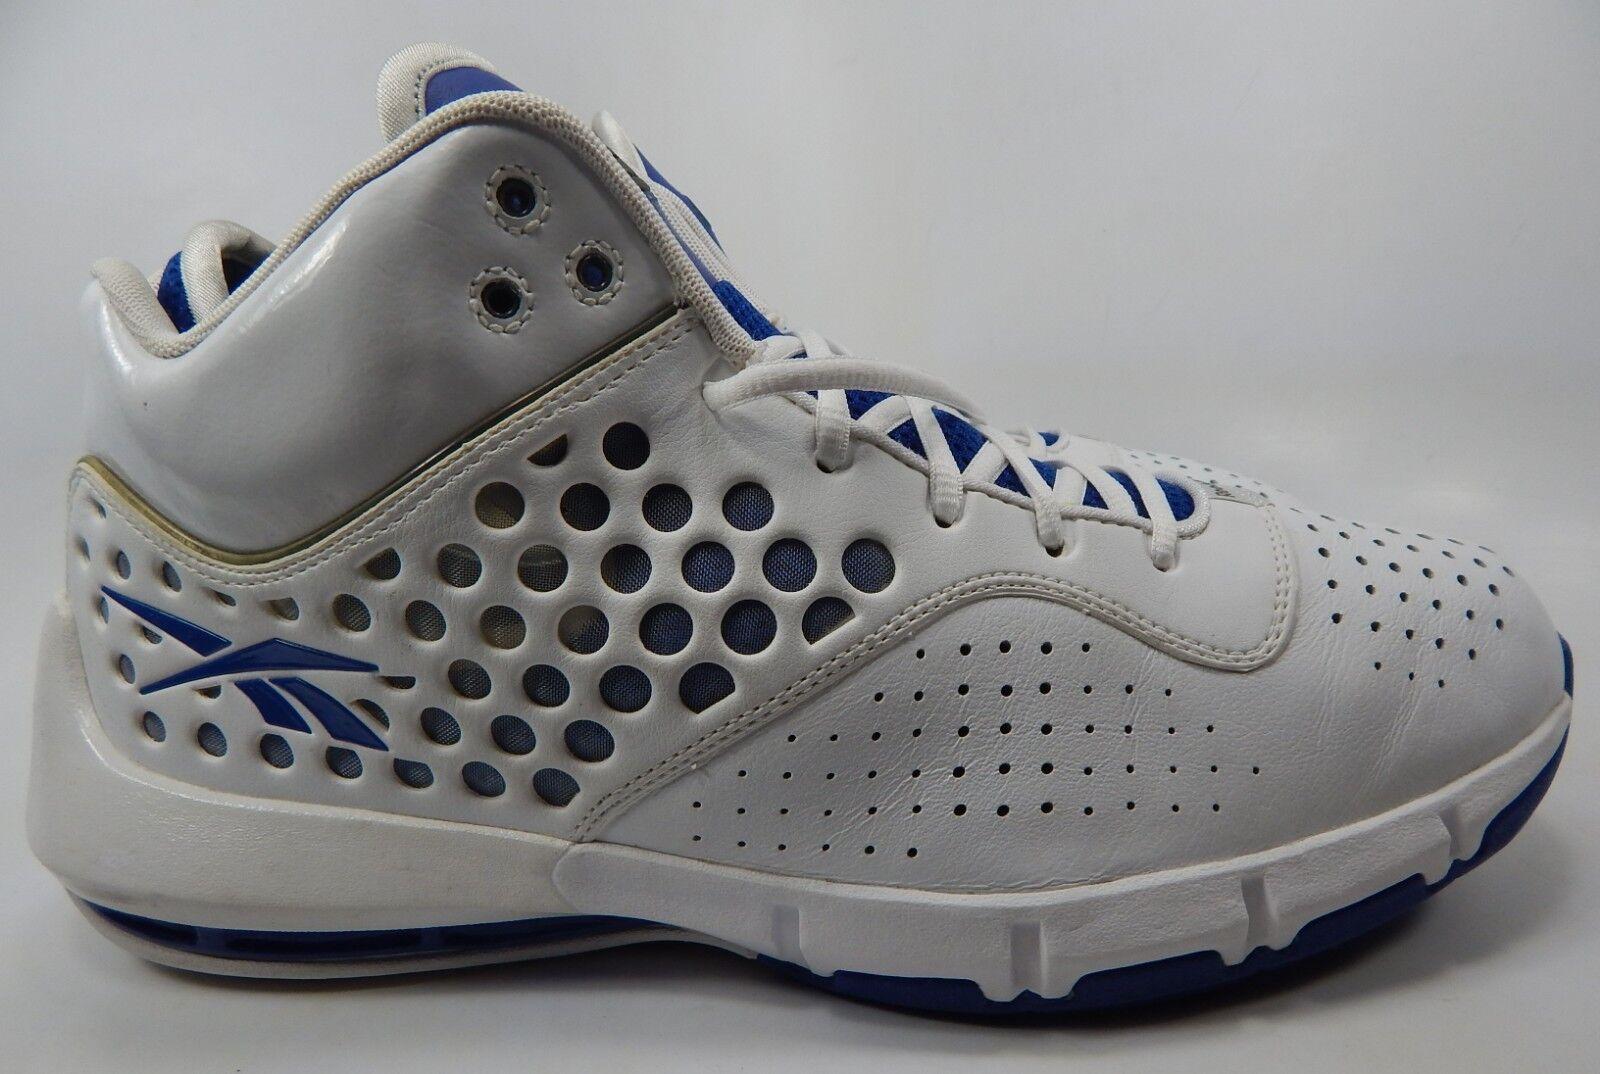 Reebok Men's Basketball shoes Size US 12.5 M (D) White bluee 4-381638